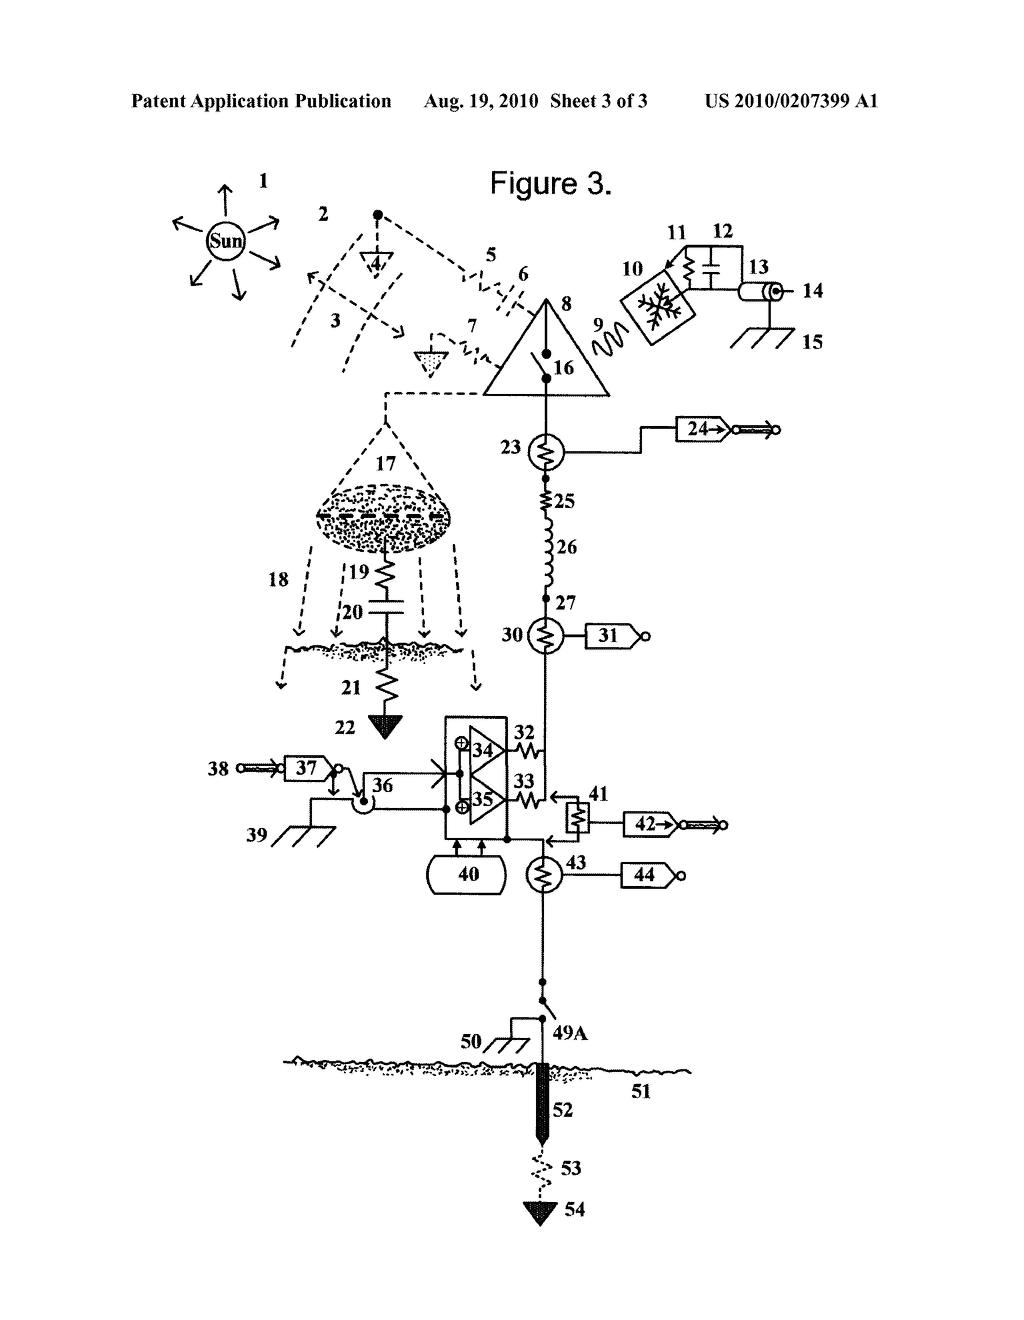 Electric Generator Diagram Simple Circuit If Images Of